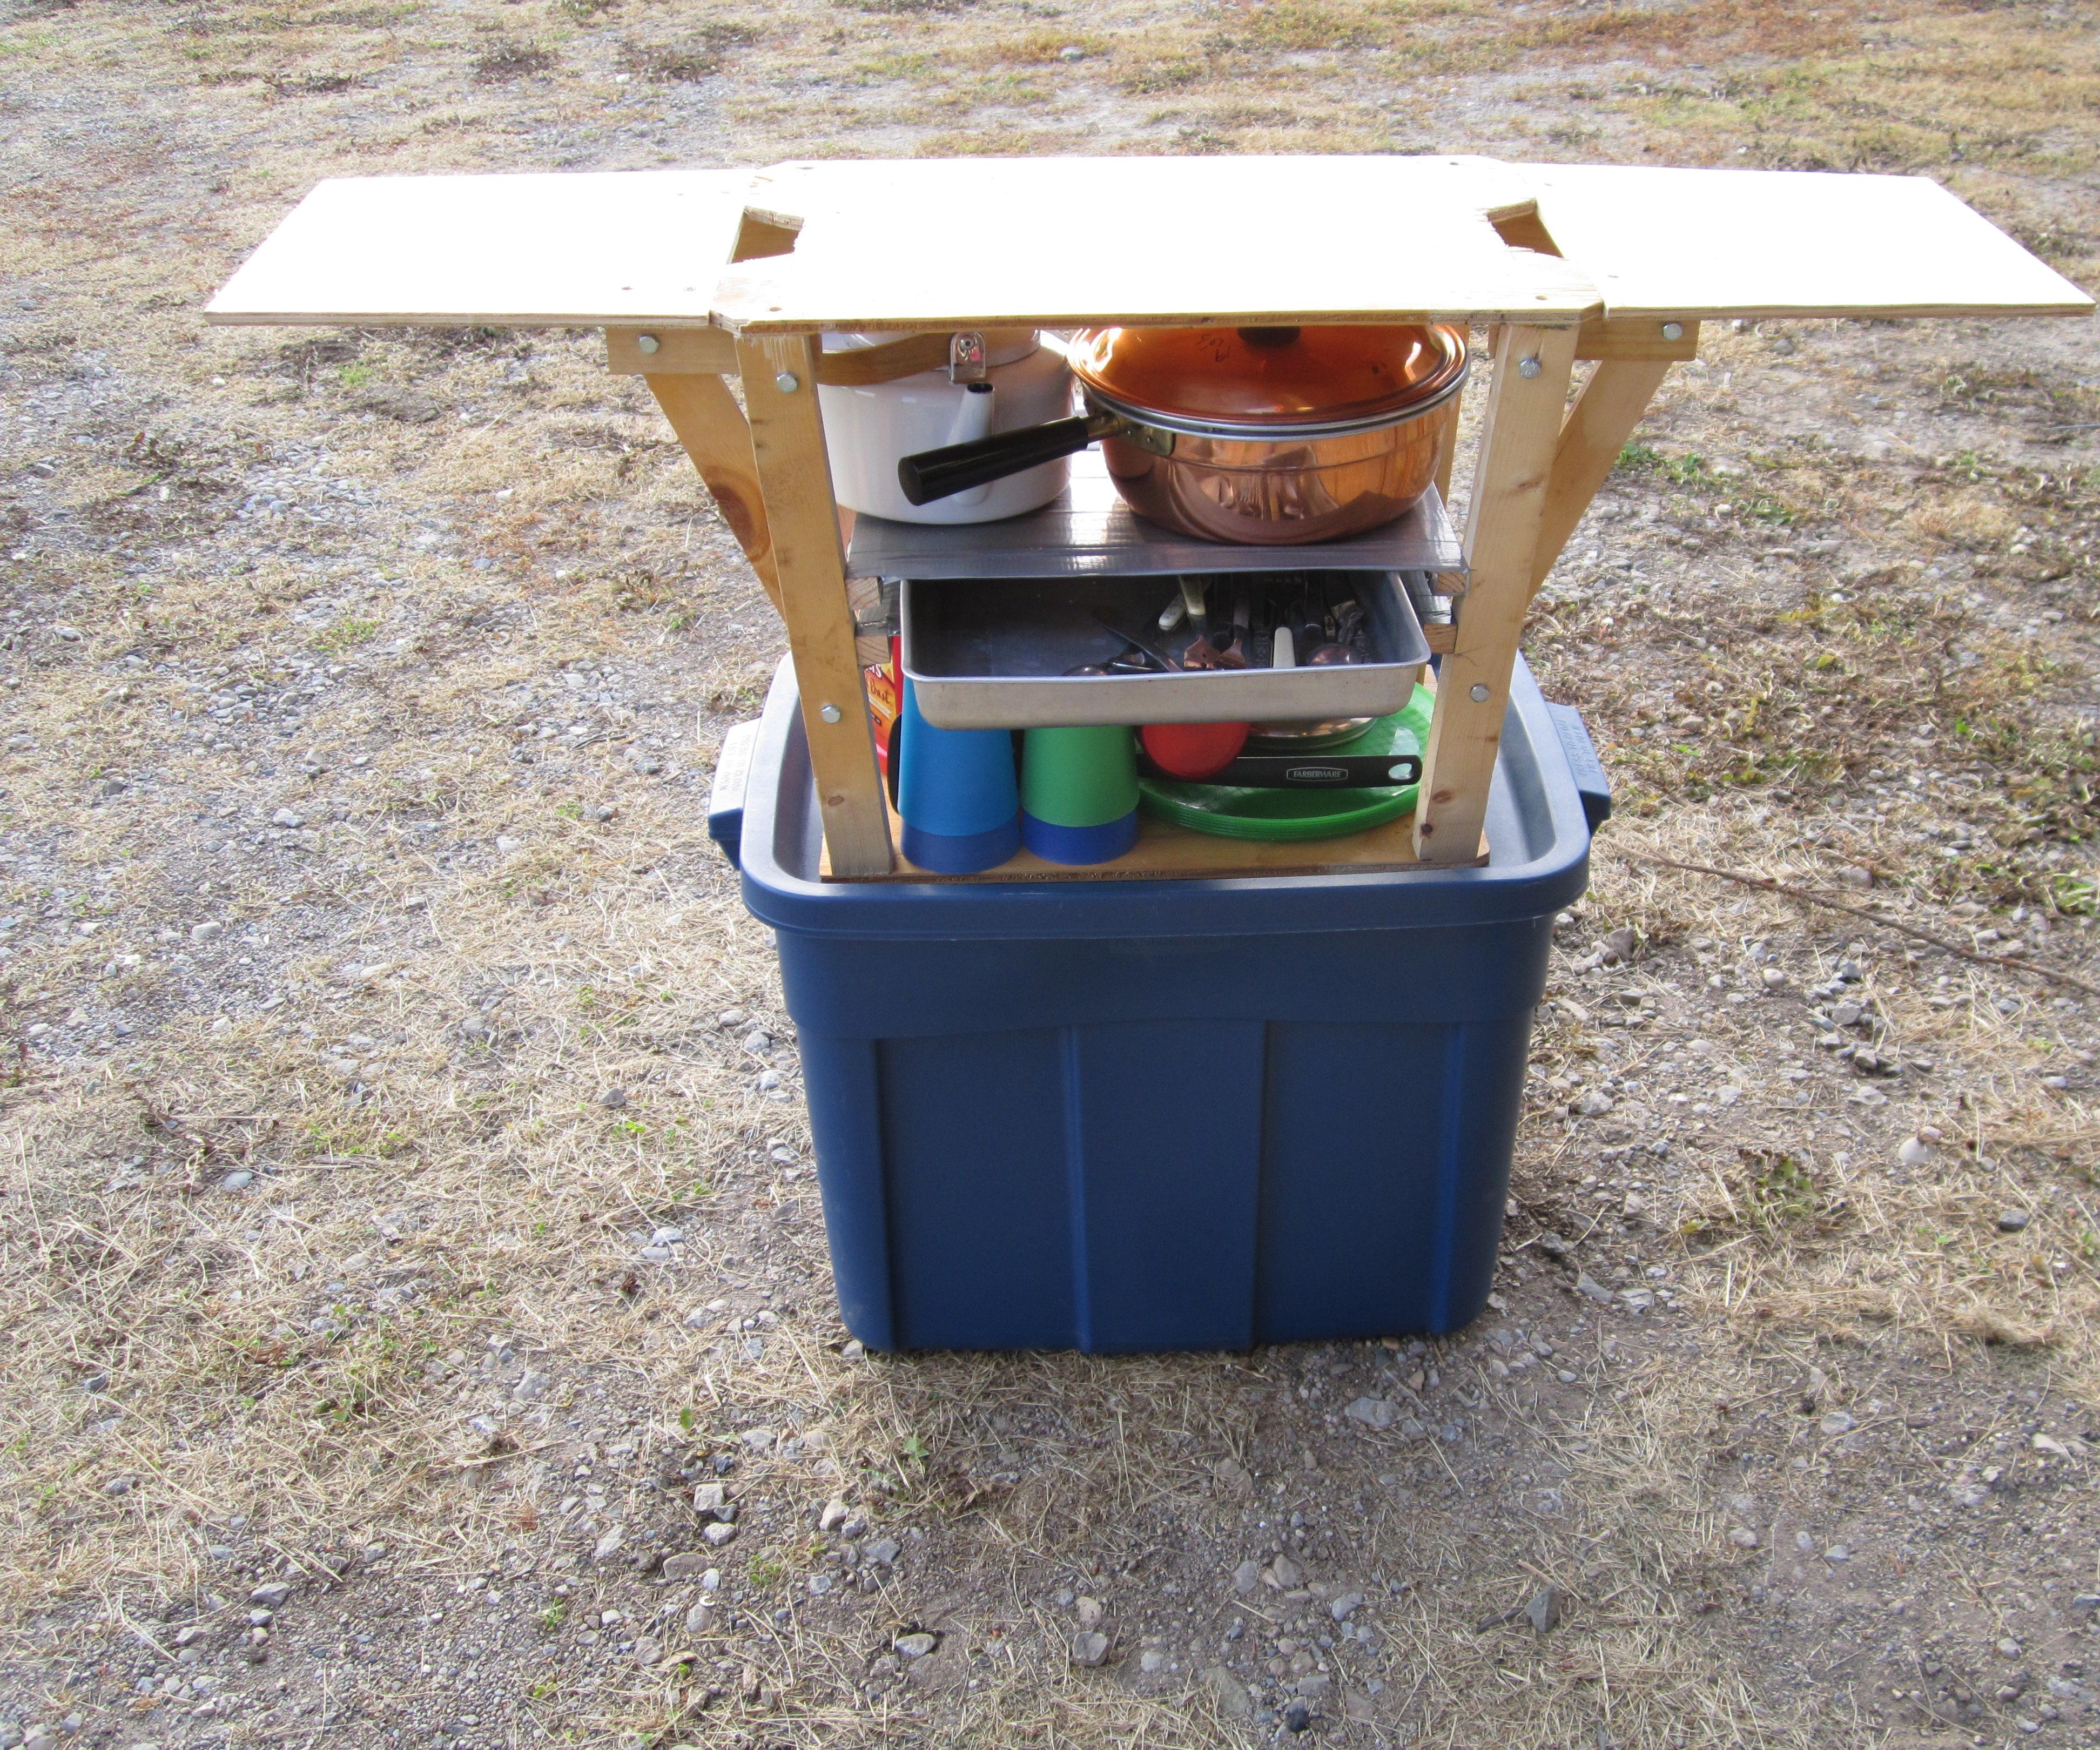 YACK BOX (Yet Another Camp Kitchen)